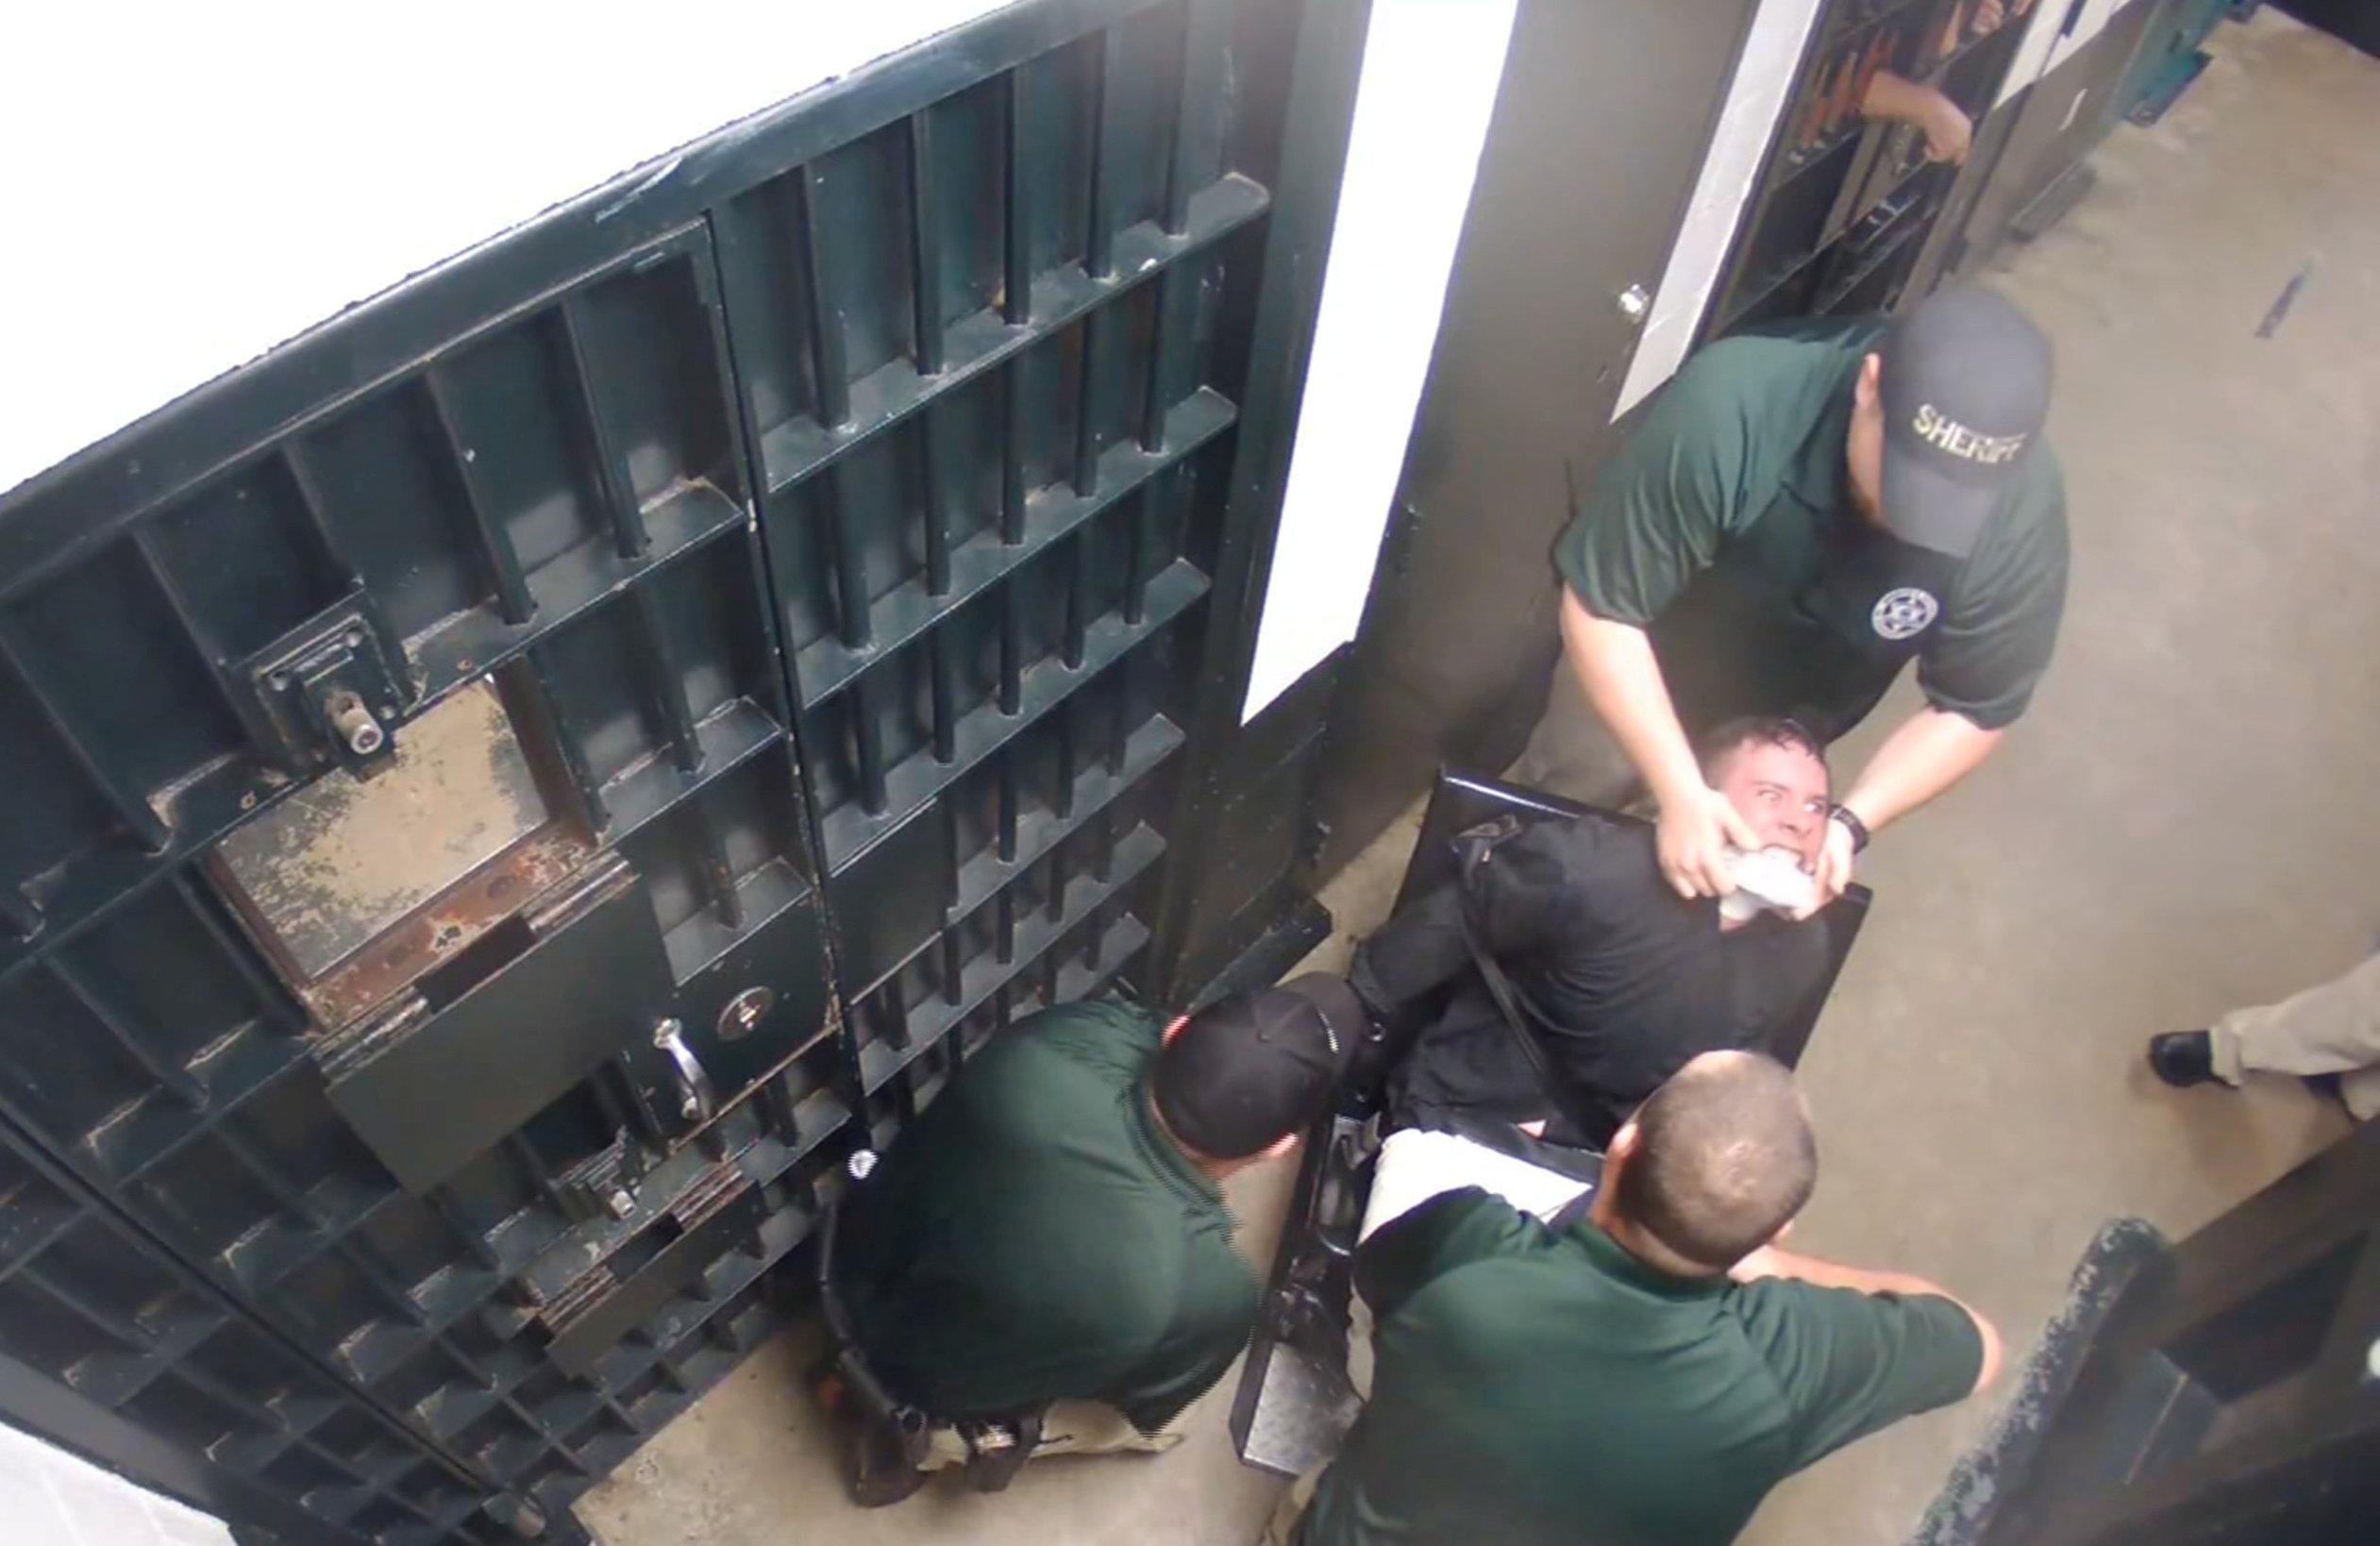 Exclusive: U.N. watchdogs call for probe of Taser assaults in U.S. jails